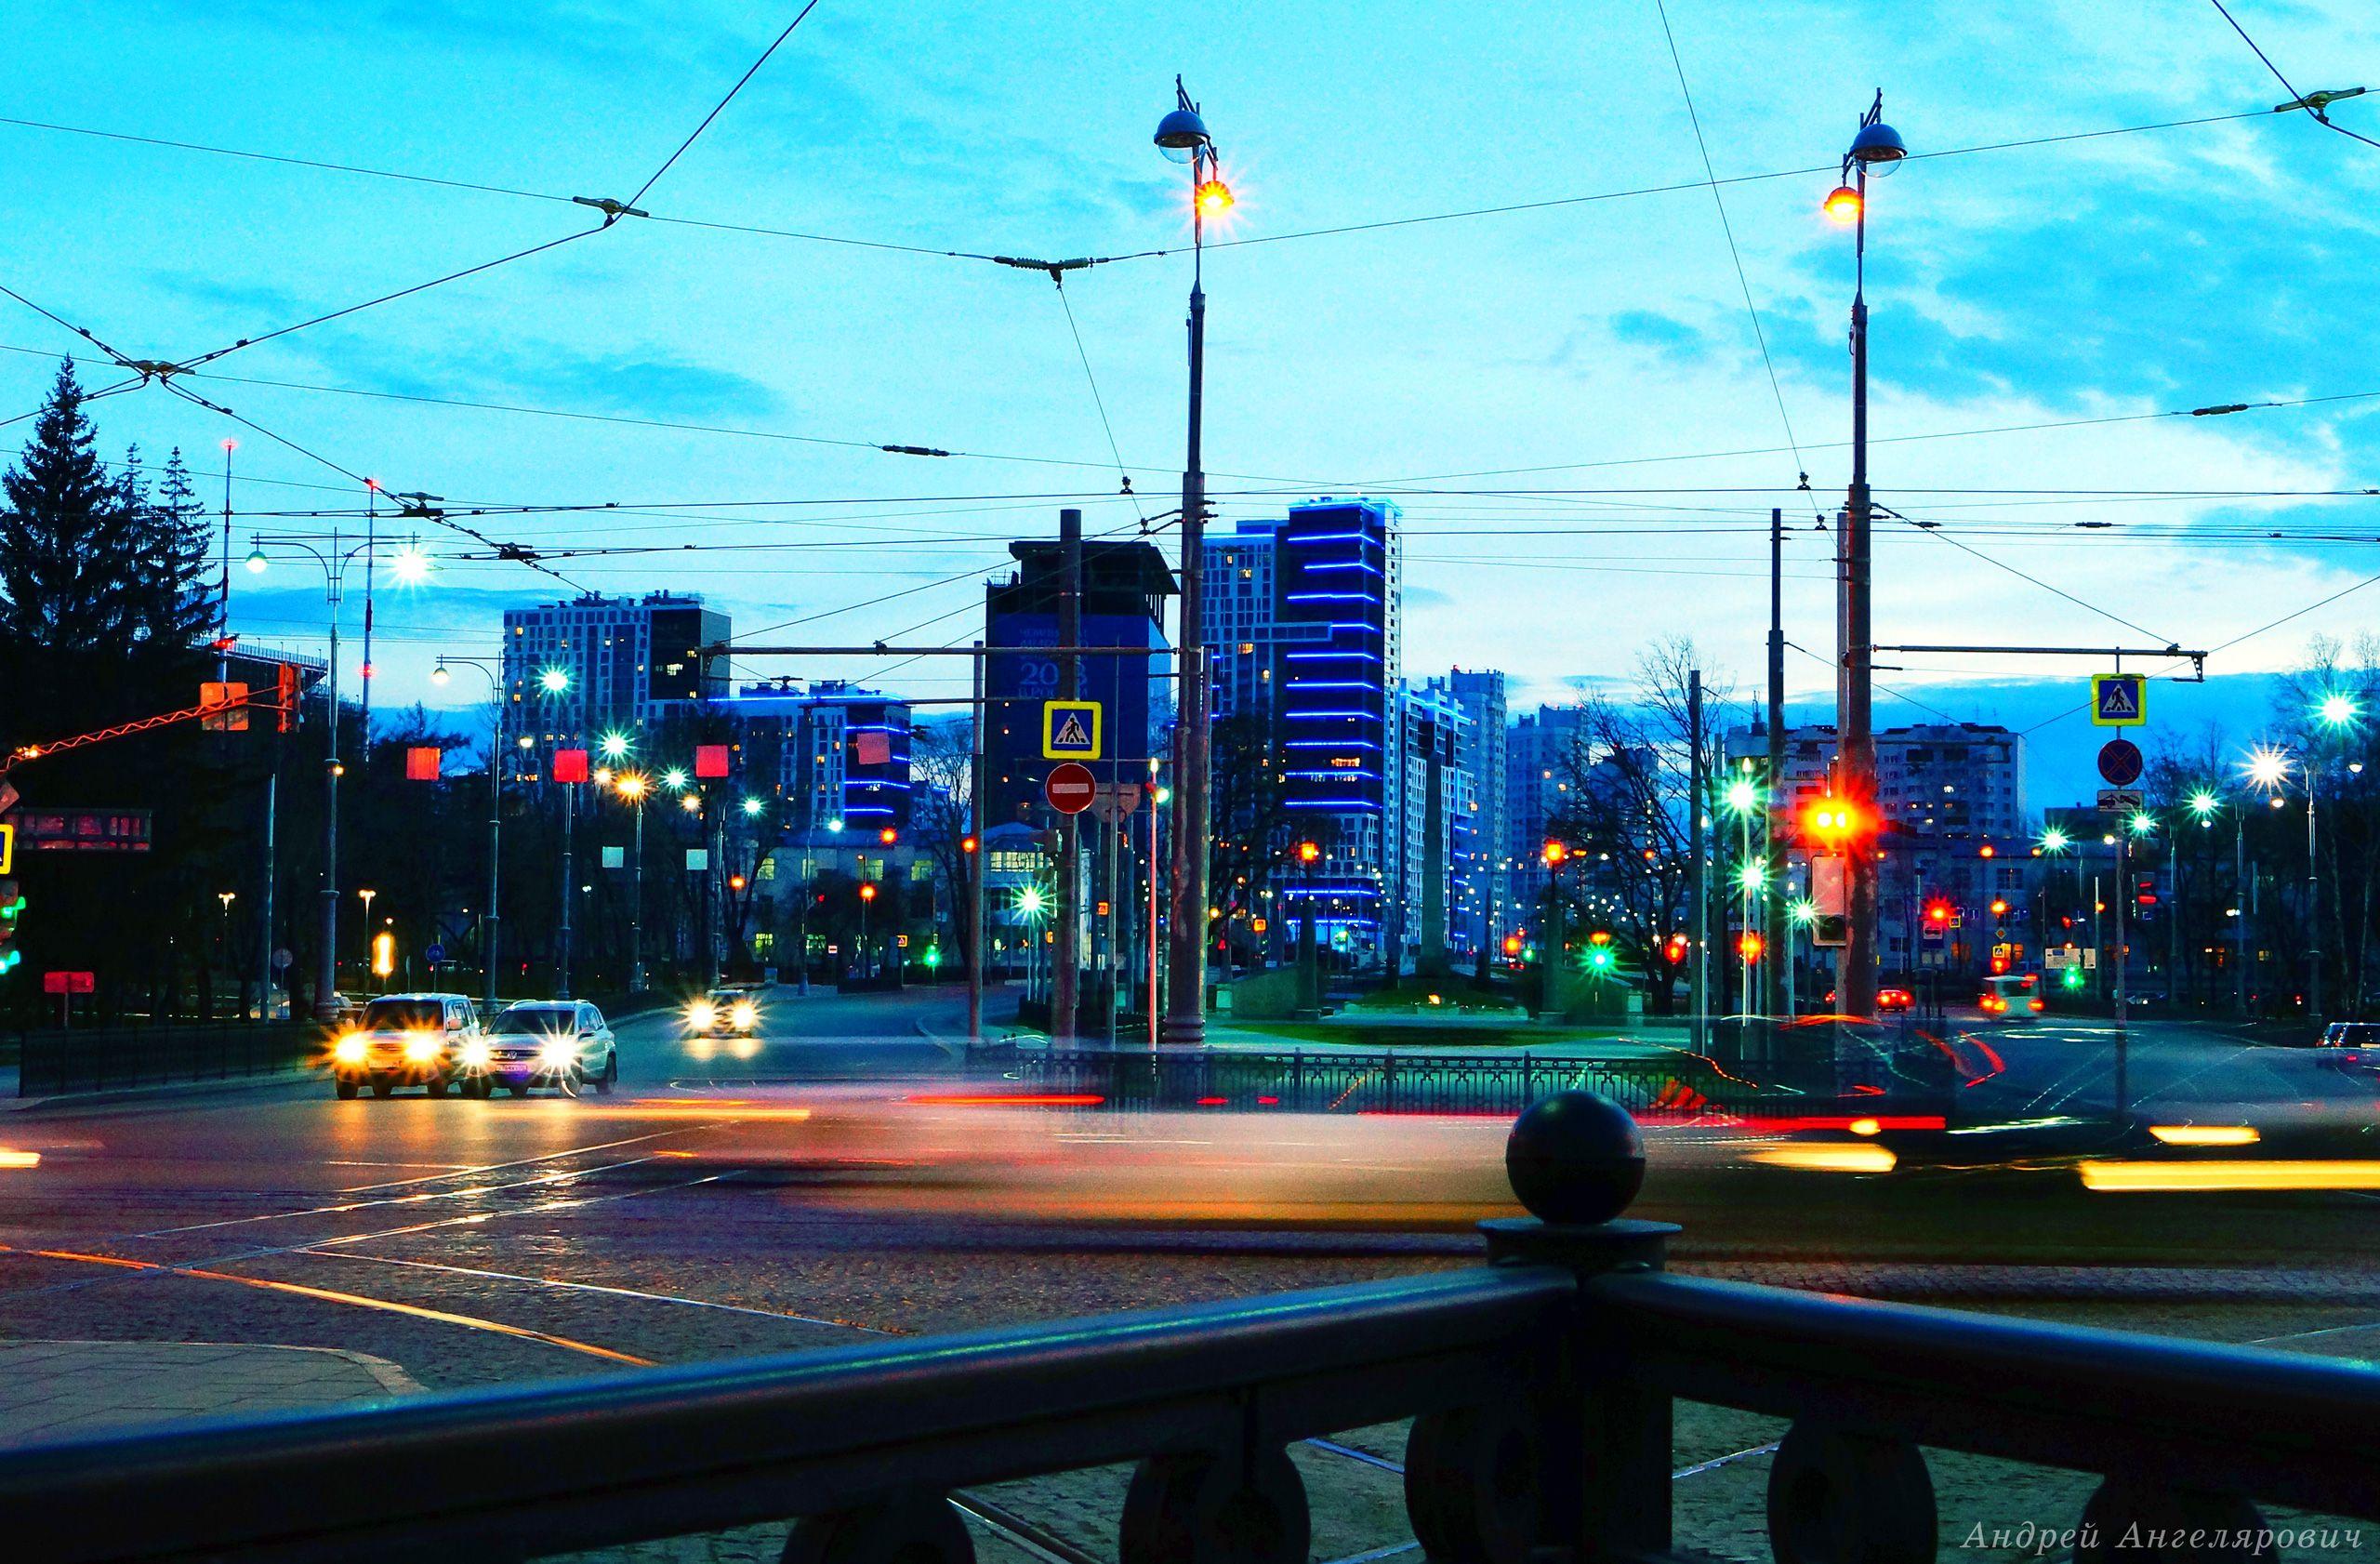 улица ленина в екатеринбурге картинки бруски